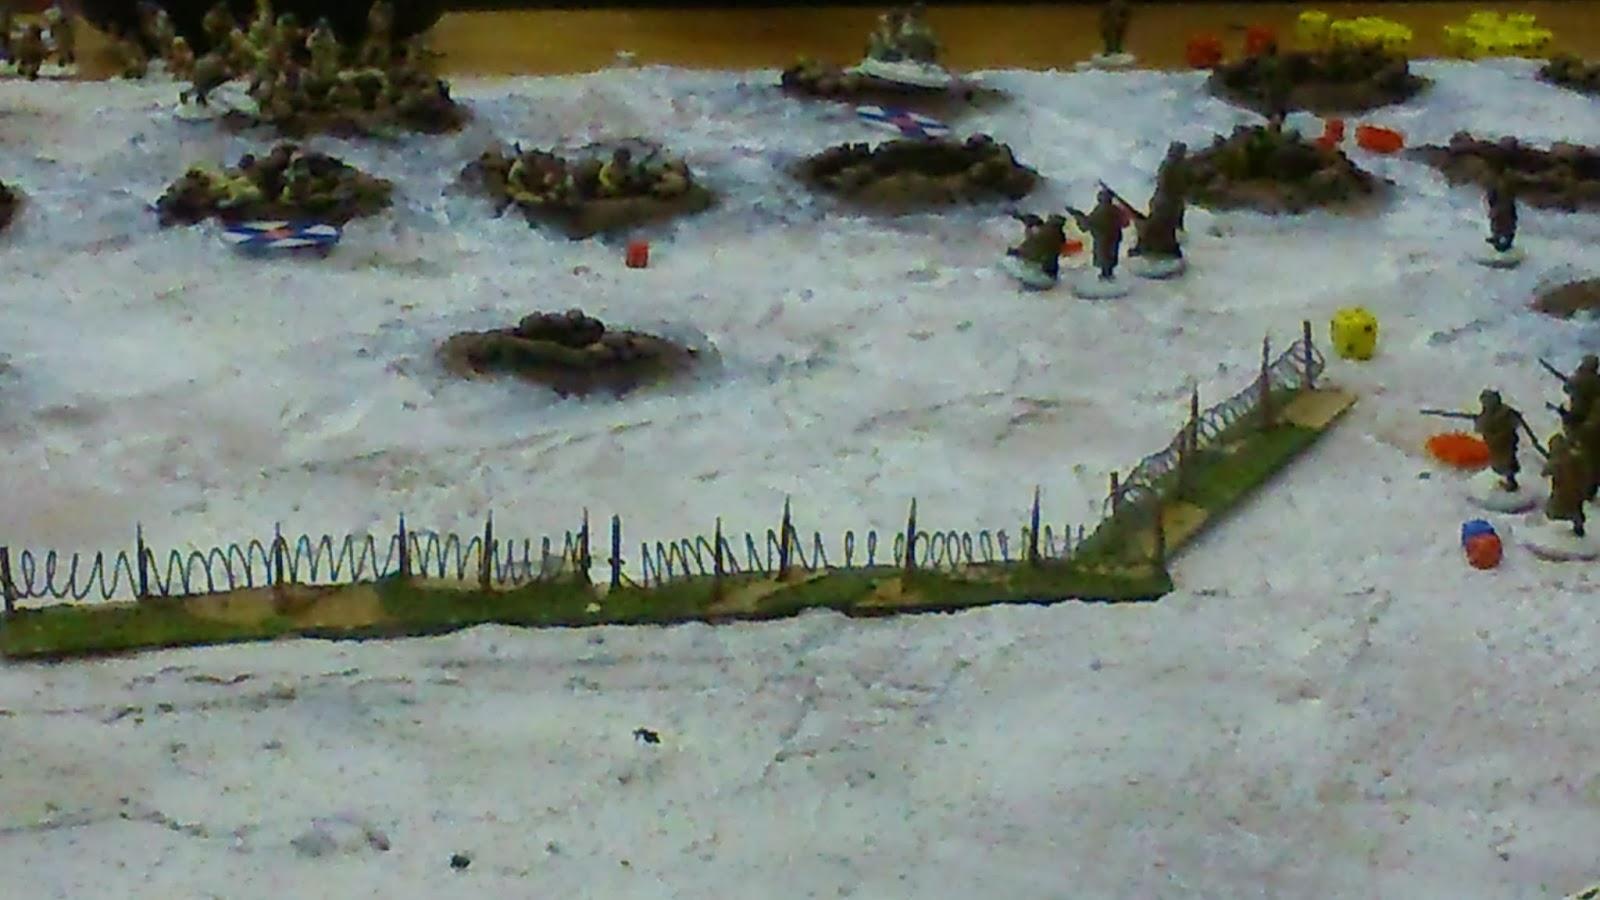 stumpy point men 2/290917/11 isbn: 978 1 84237 147 3 robin and the sherwood hoodies junior script by craig hawes.